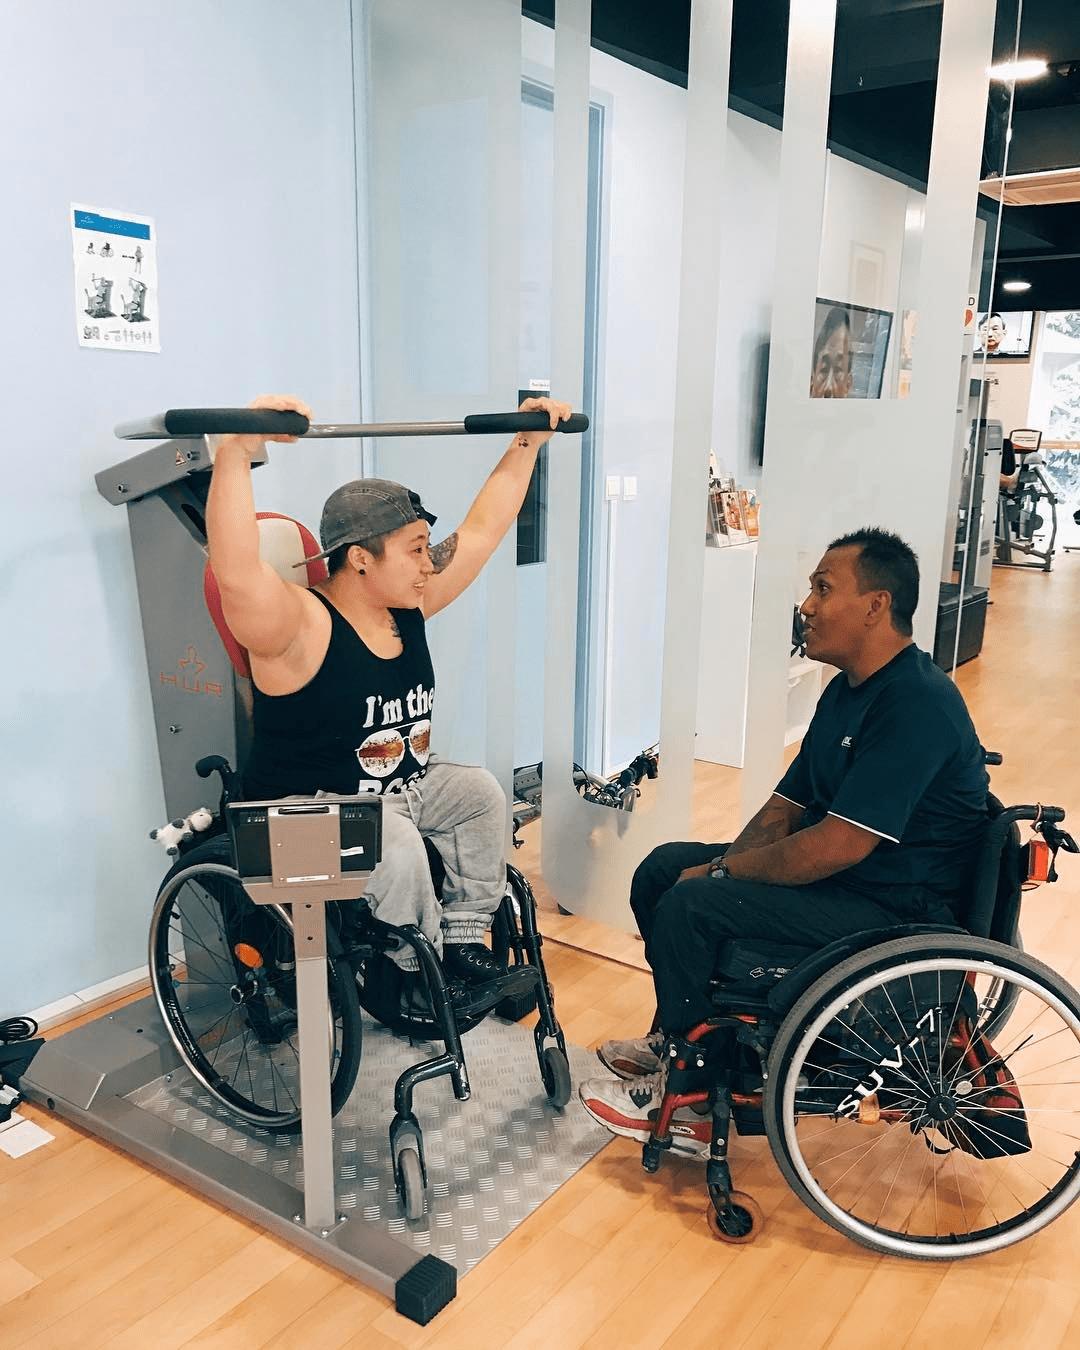 Enabling Village ActiveSG Gym